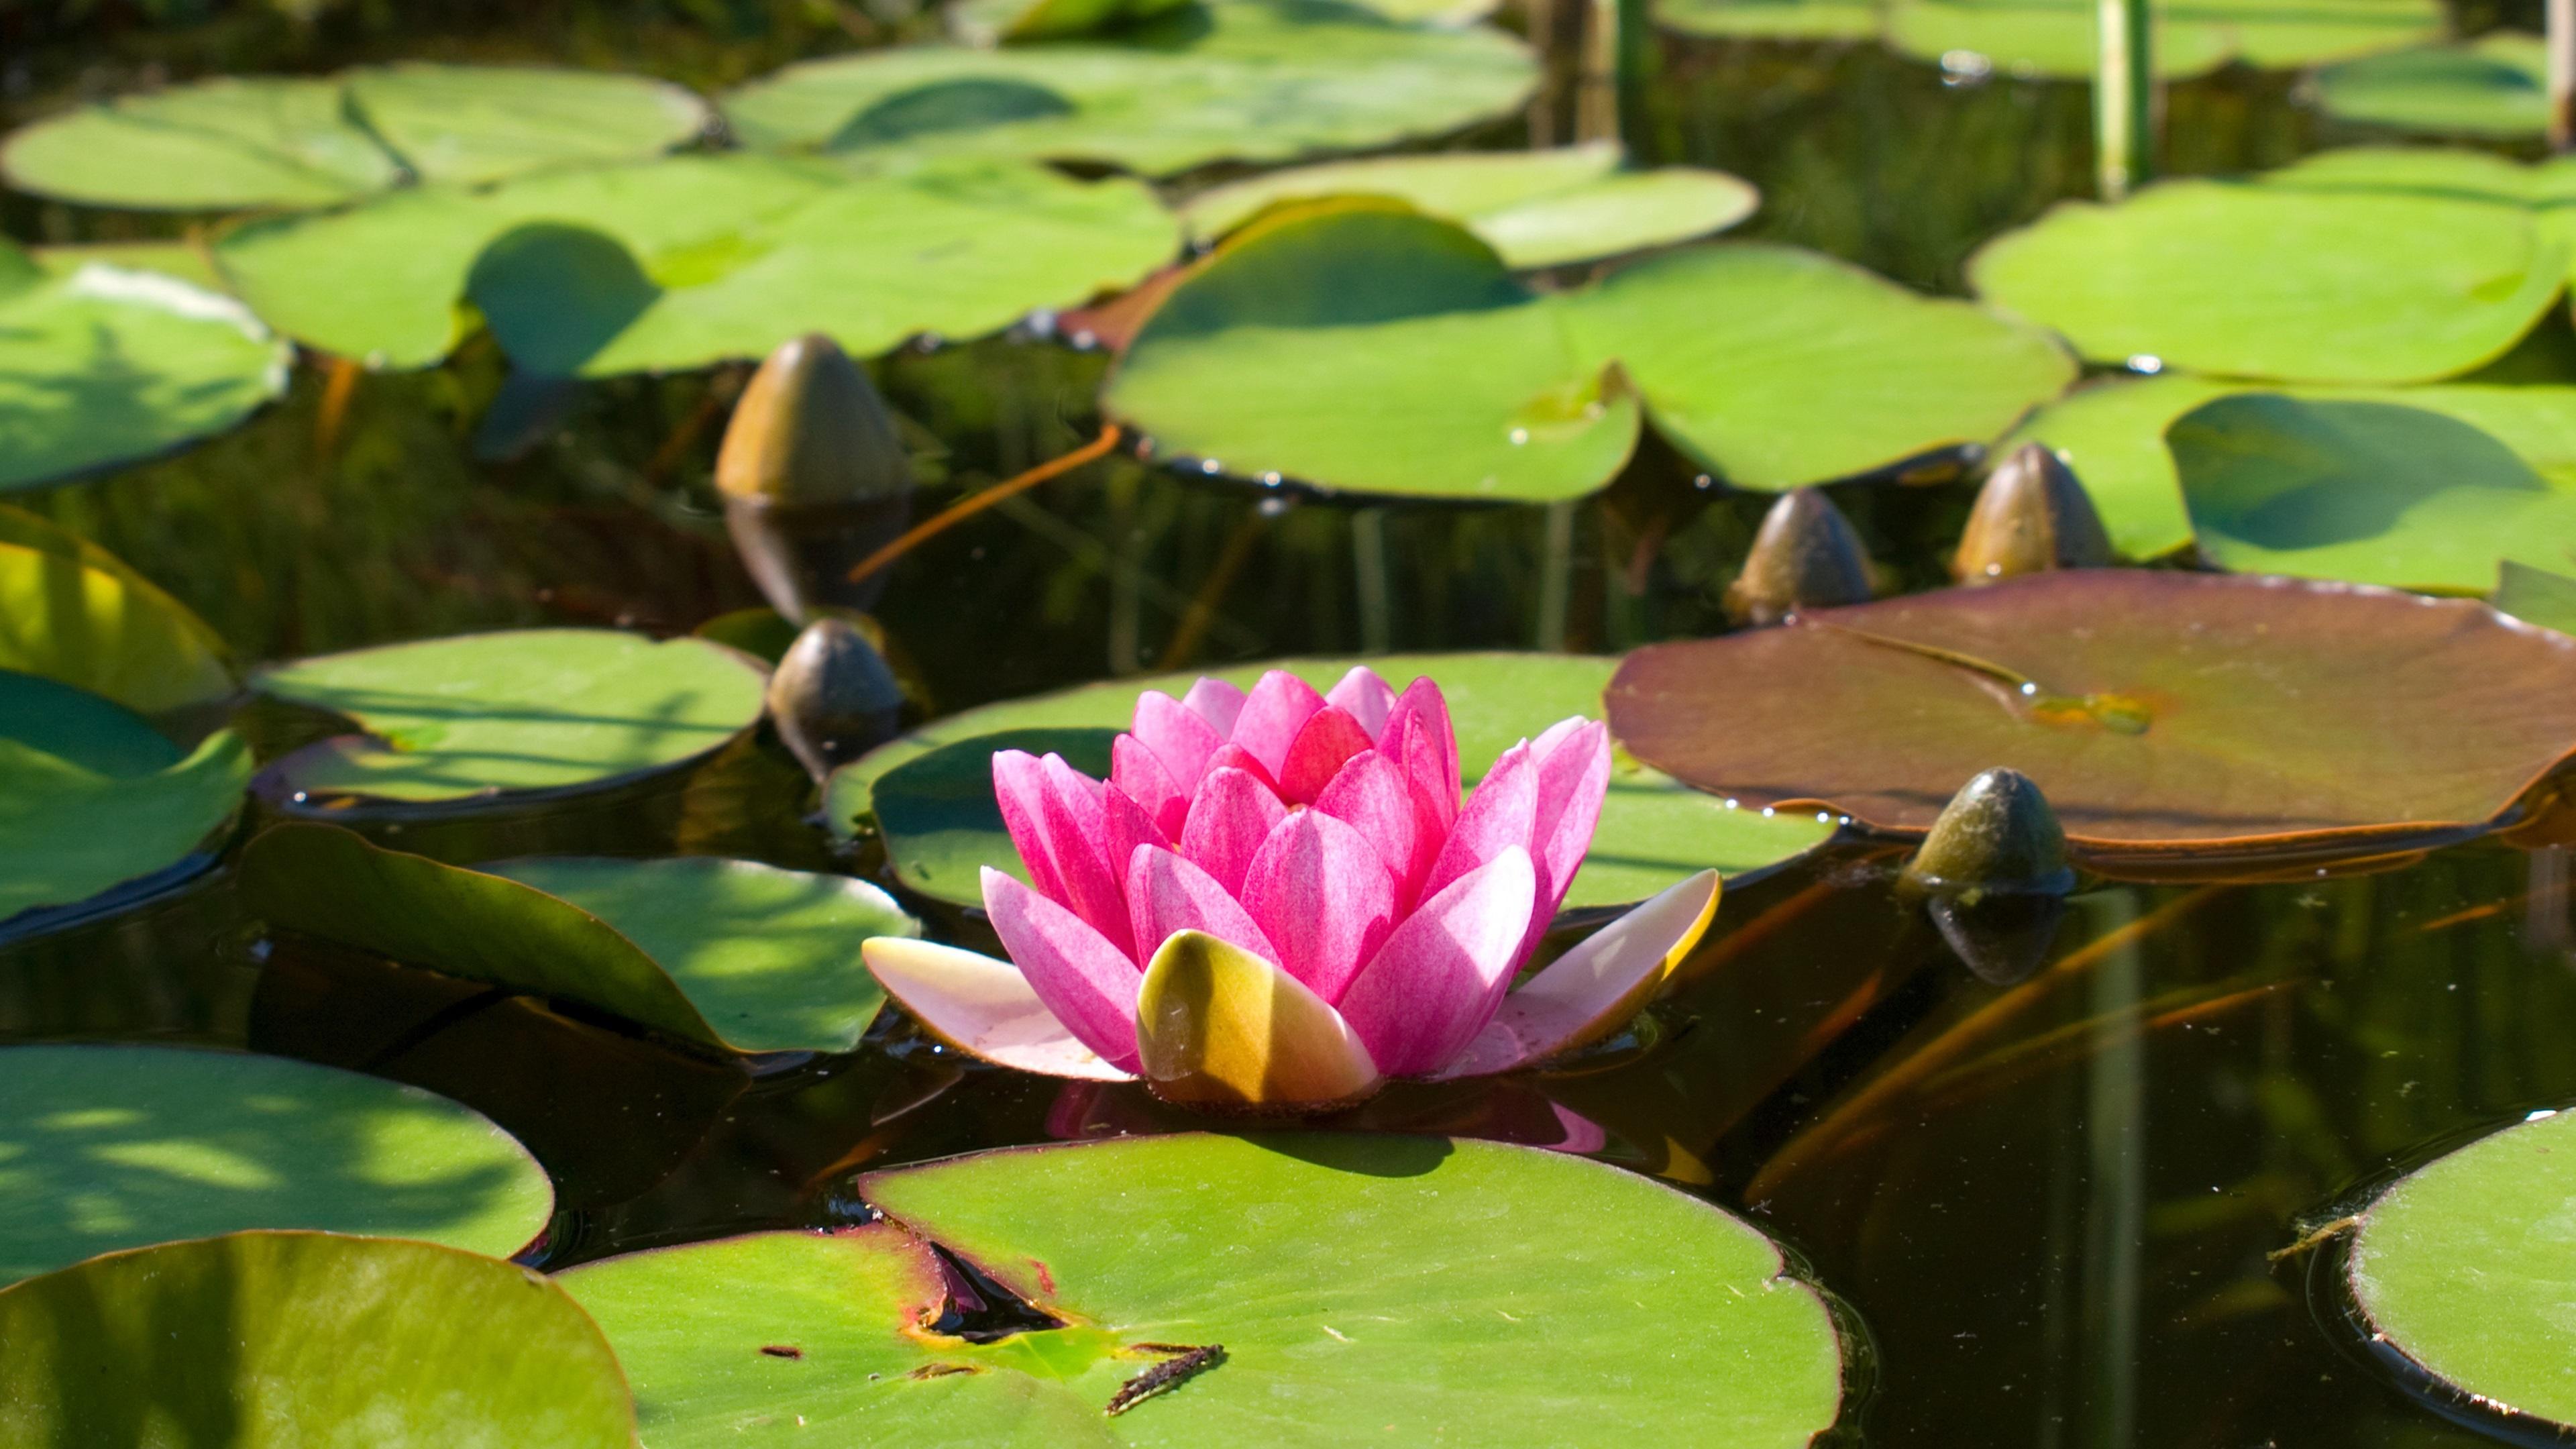 Buddha Hd Wallpaper 1080p Pink Water Lily Lotus Pond Water Leaves Wallpaper